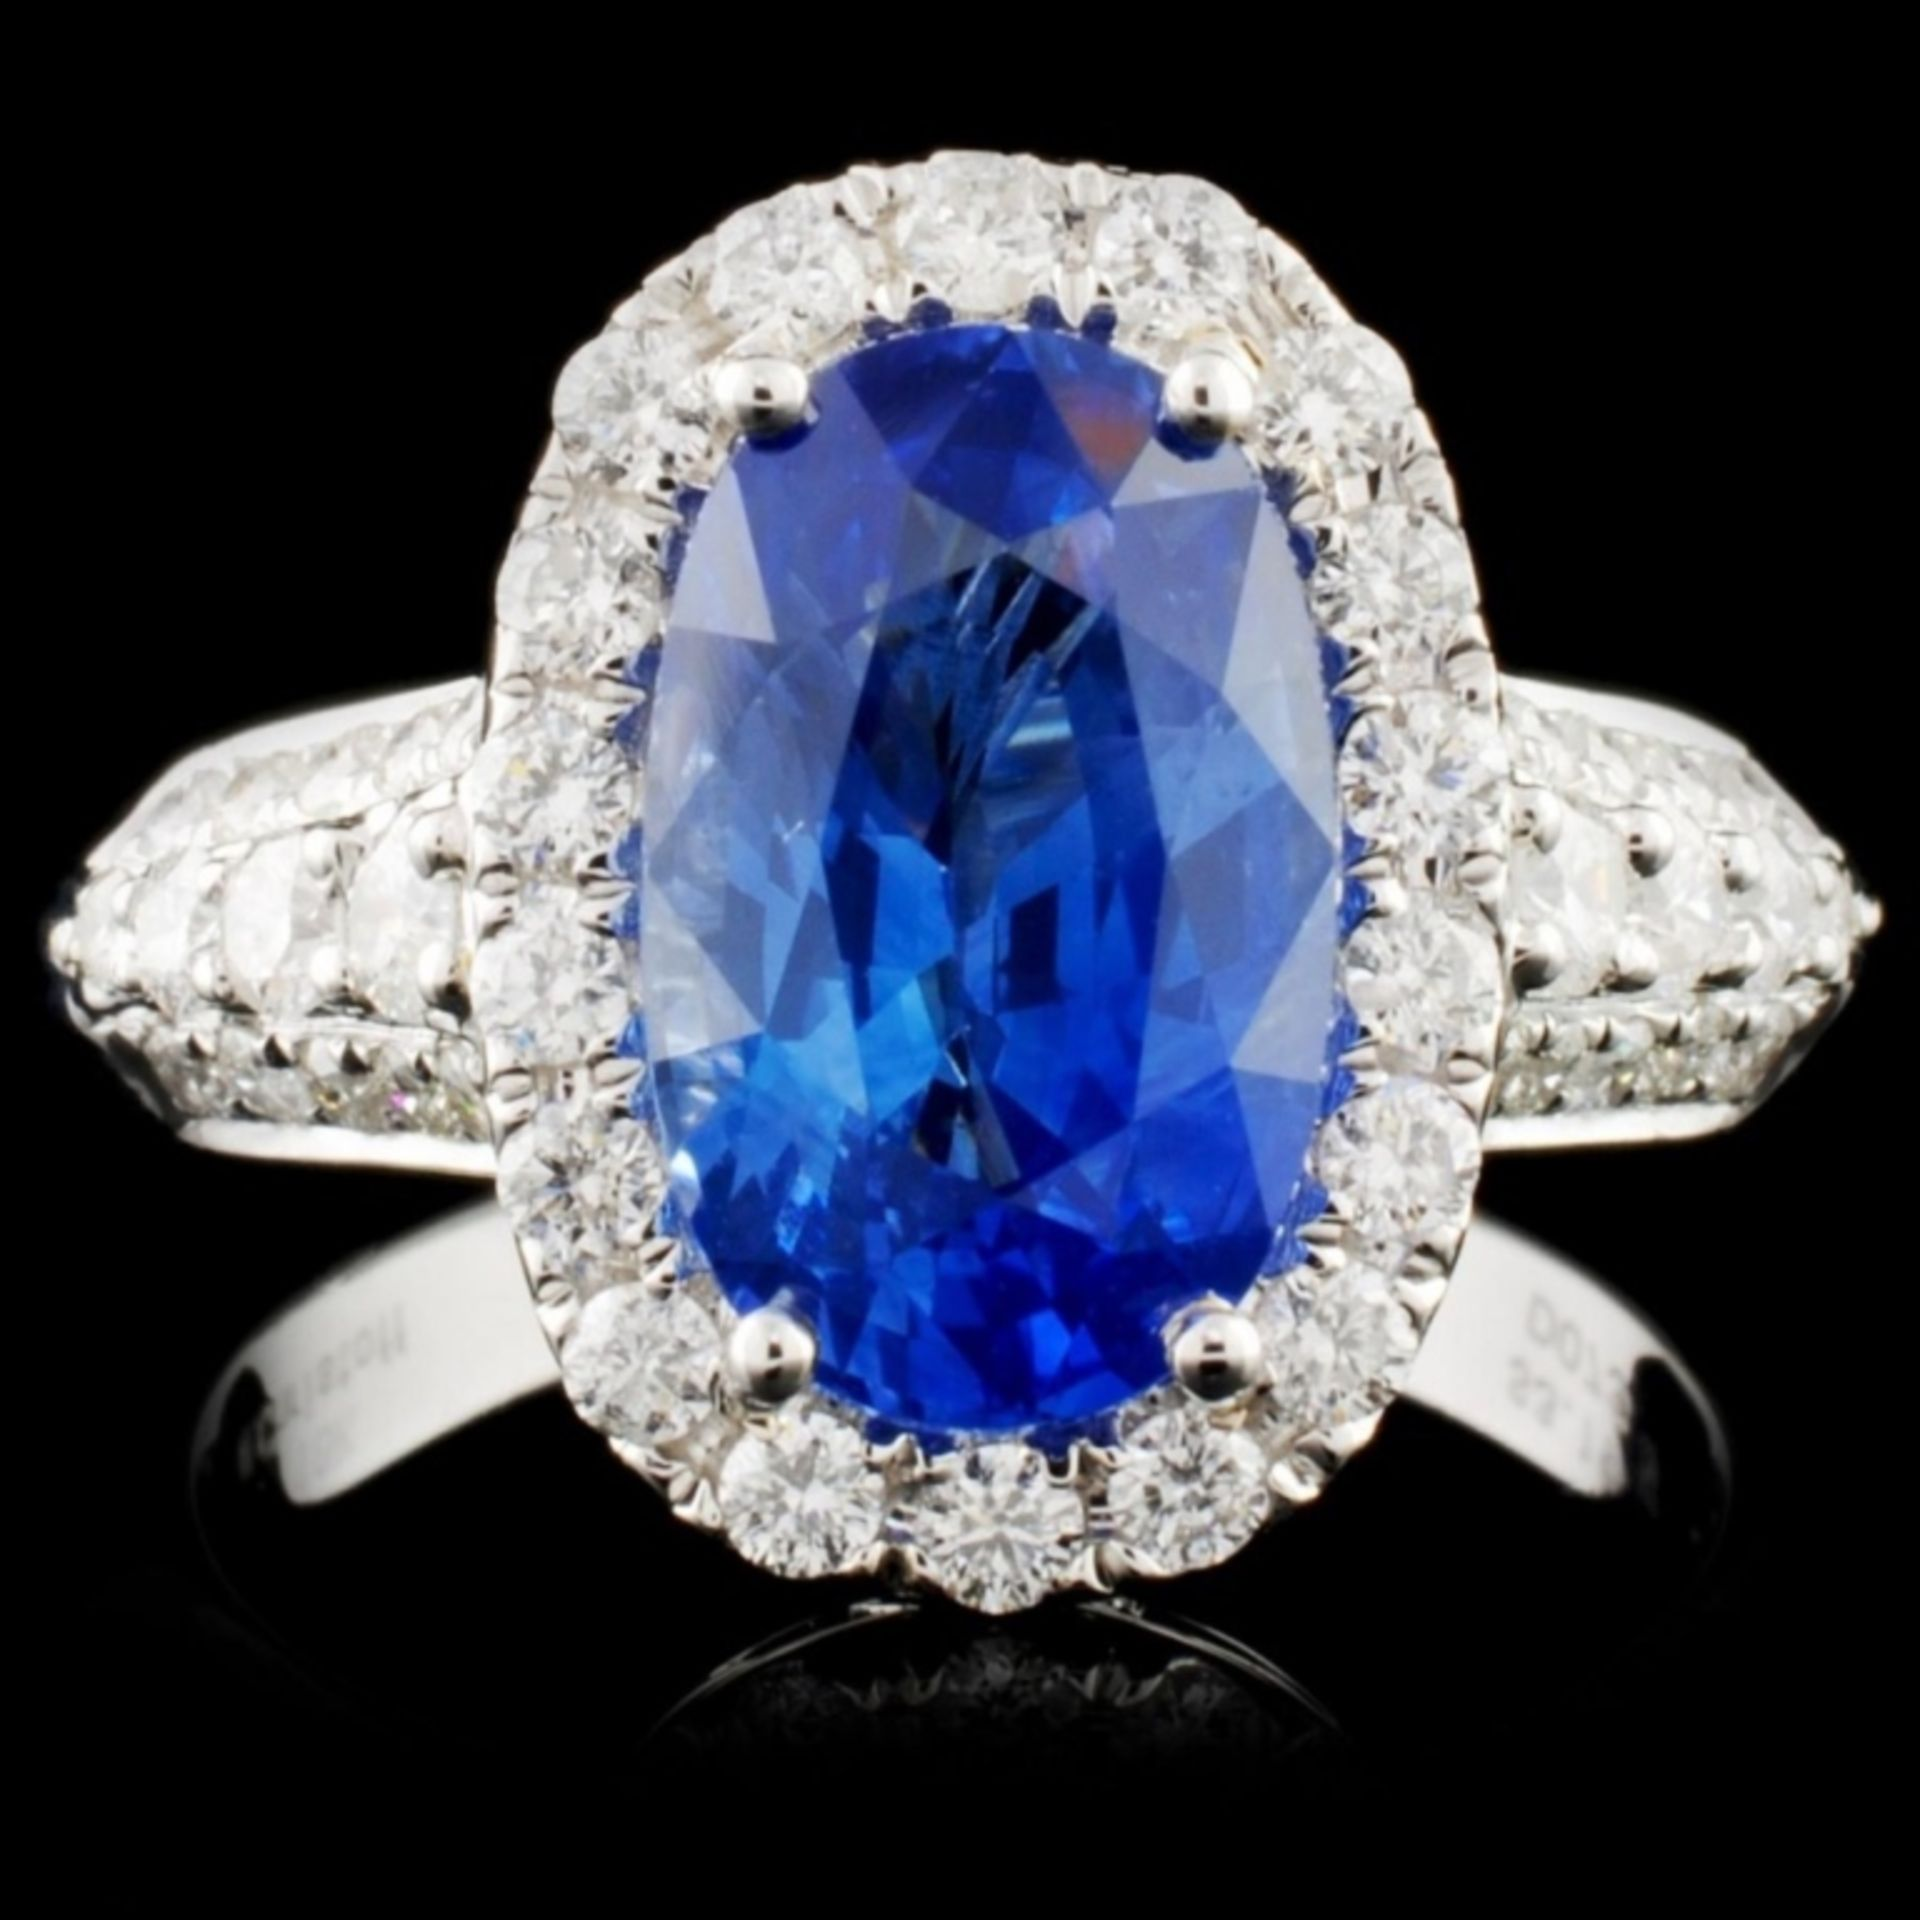 18K White Gold 3.19ct Sapphire & 0.73ct Diamond Ri